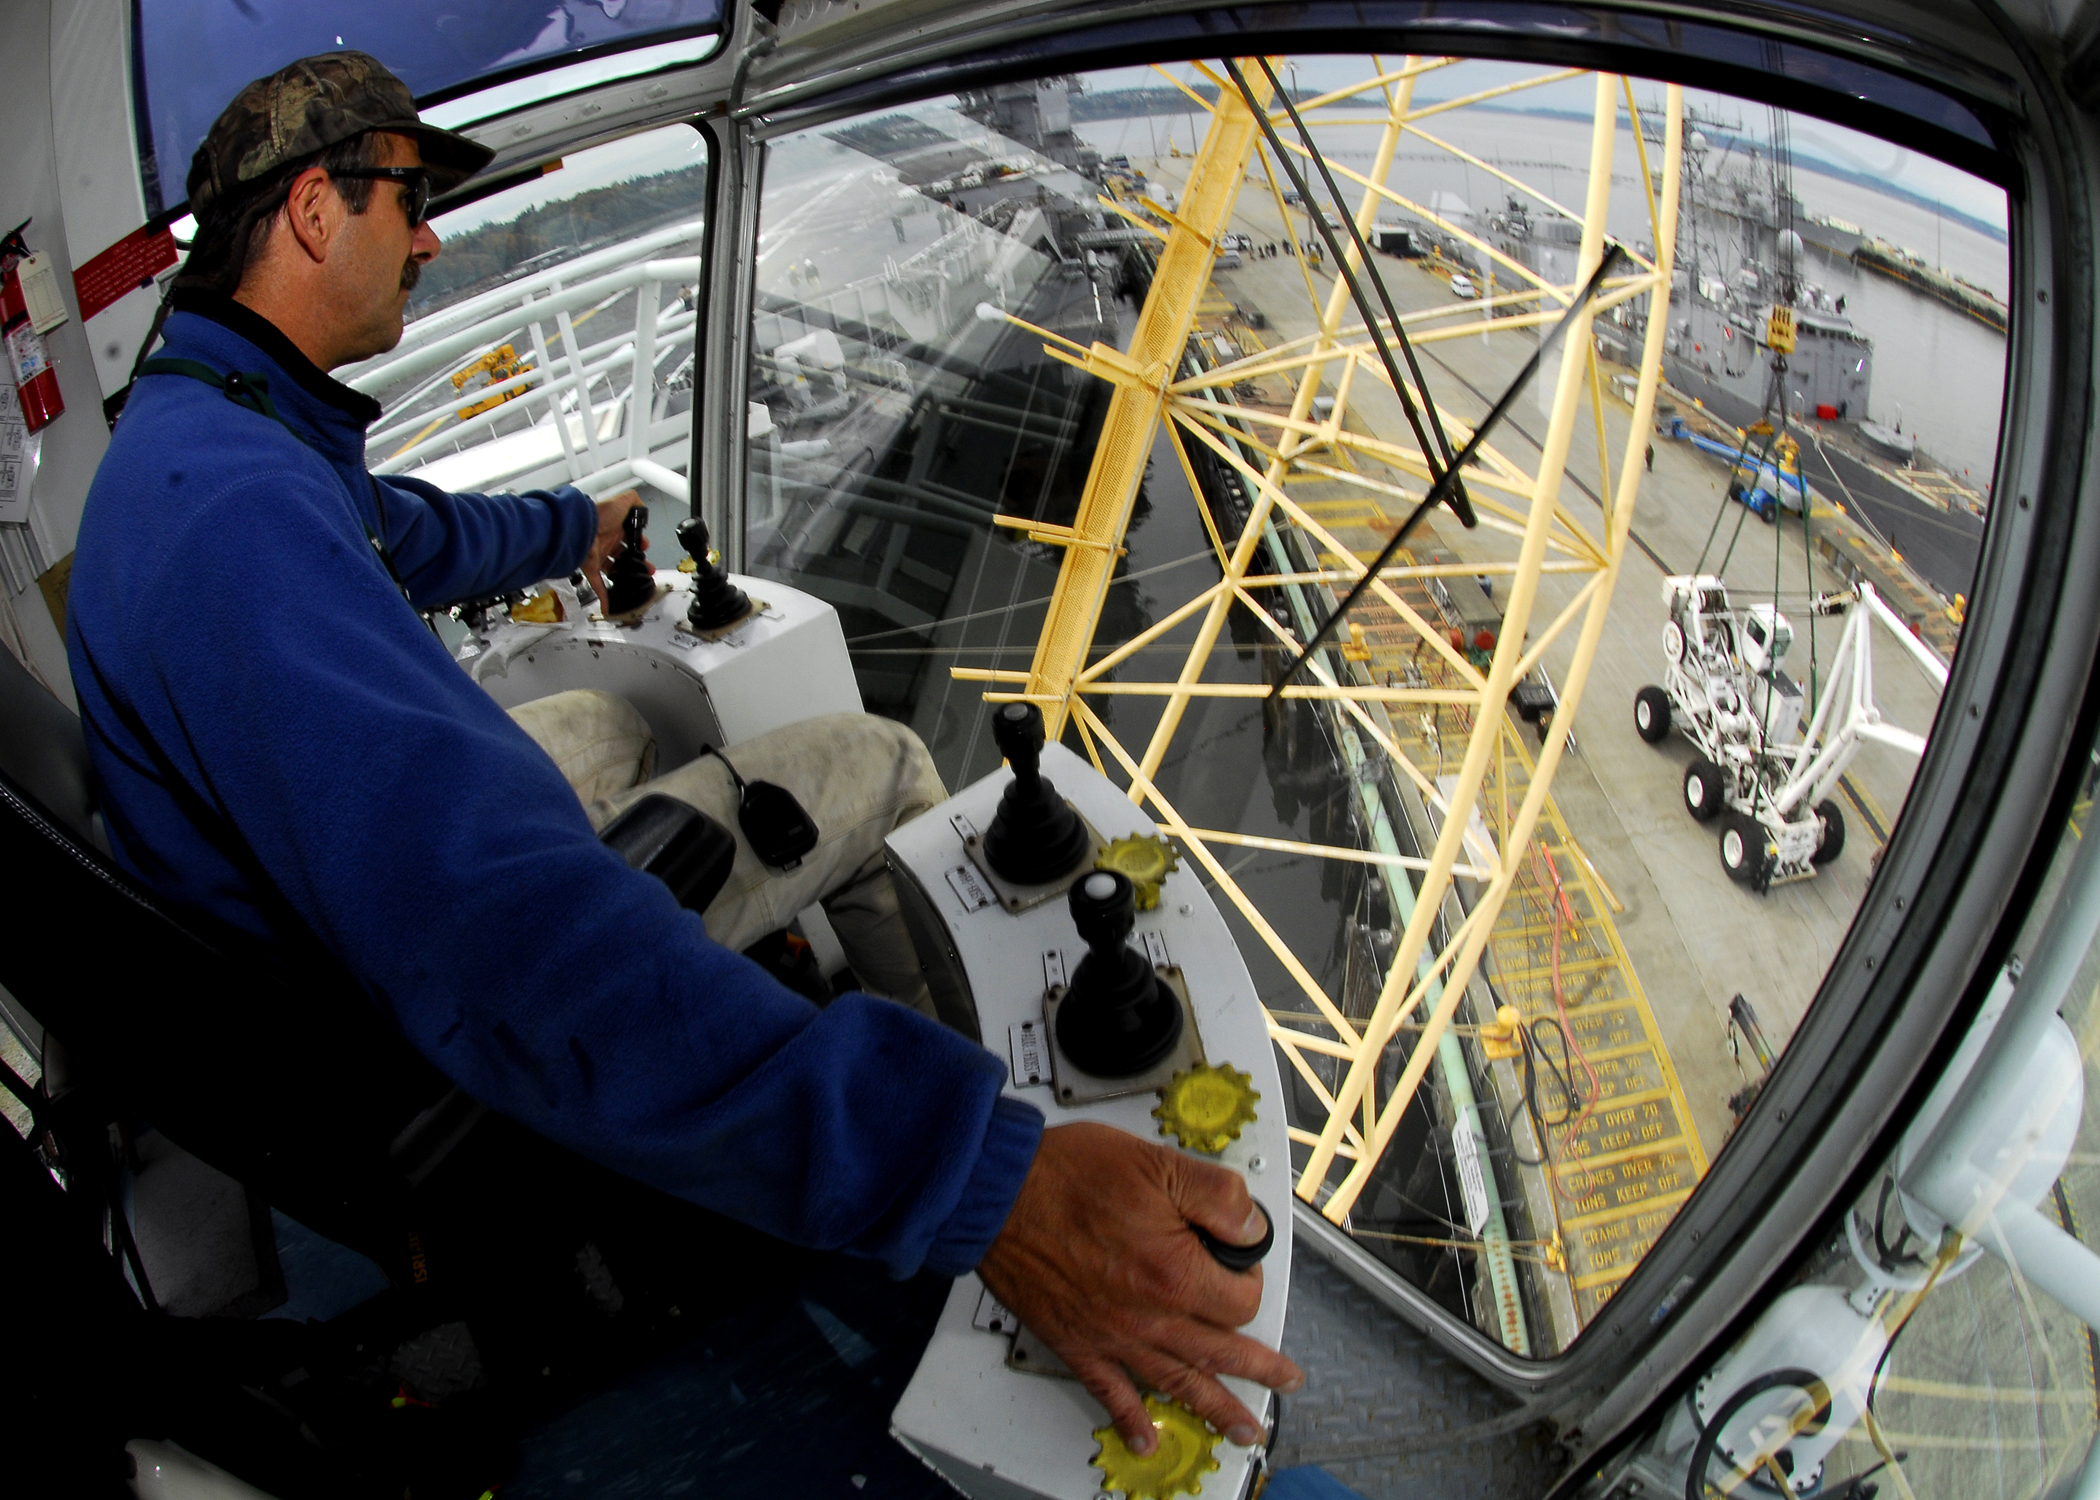 File:US Navy 071009-N-1745W-089 A Puget Sound Naval Shipyard